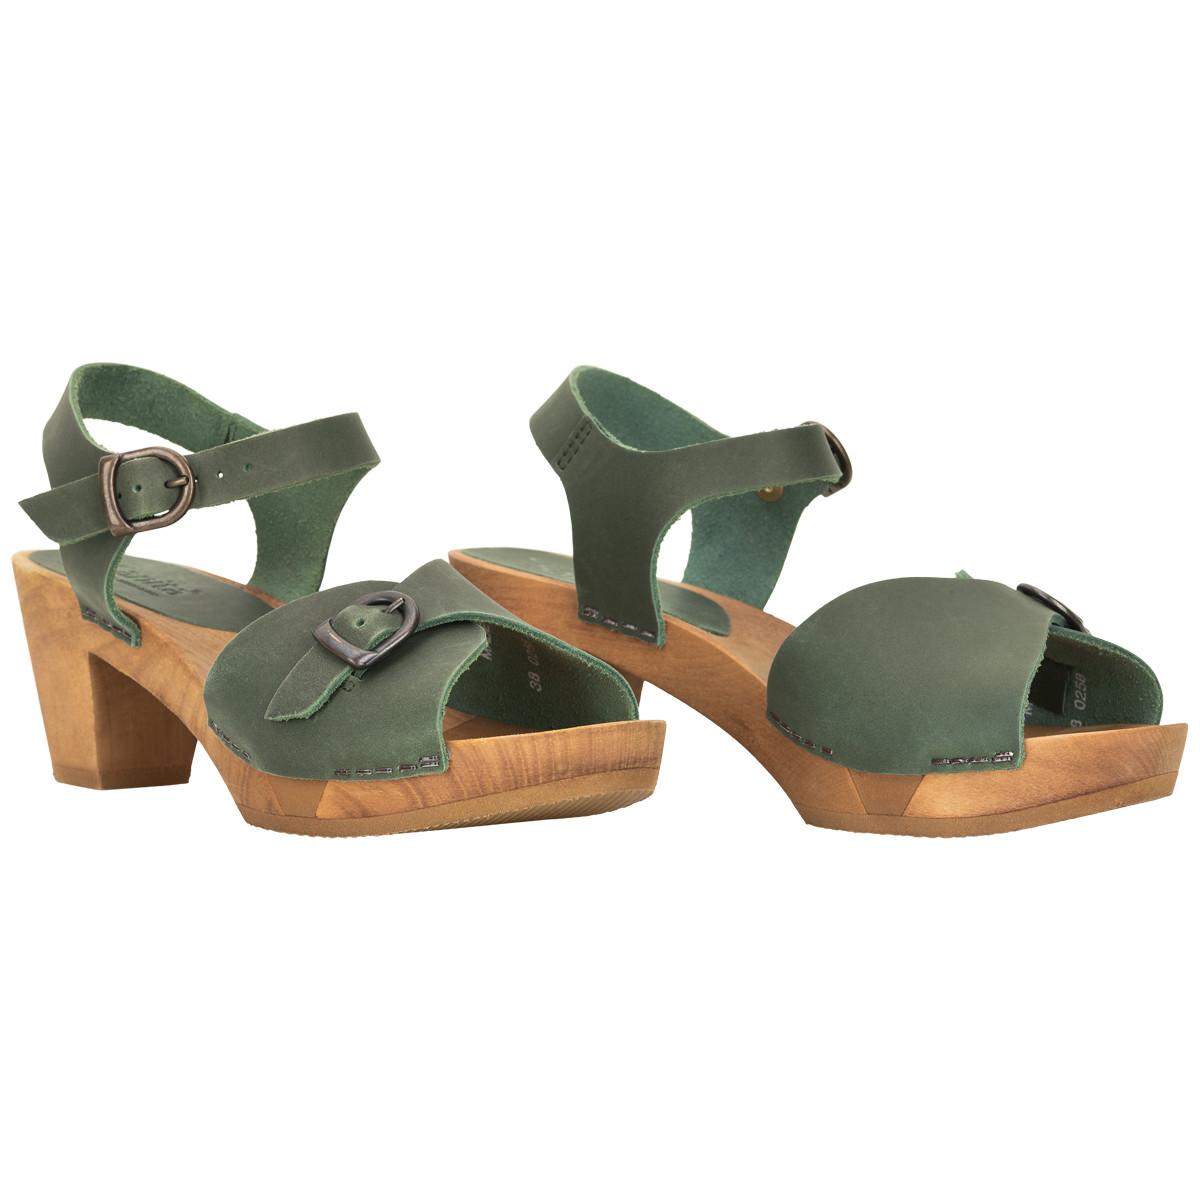 43d10297c459 SANITA • Sanita Vilma Flex Sandal 470621 73 • Price 99.9